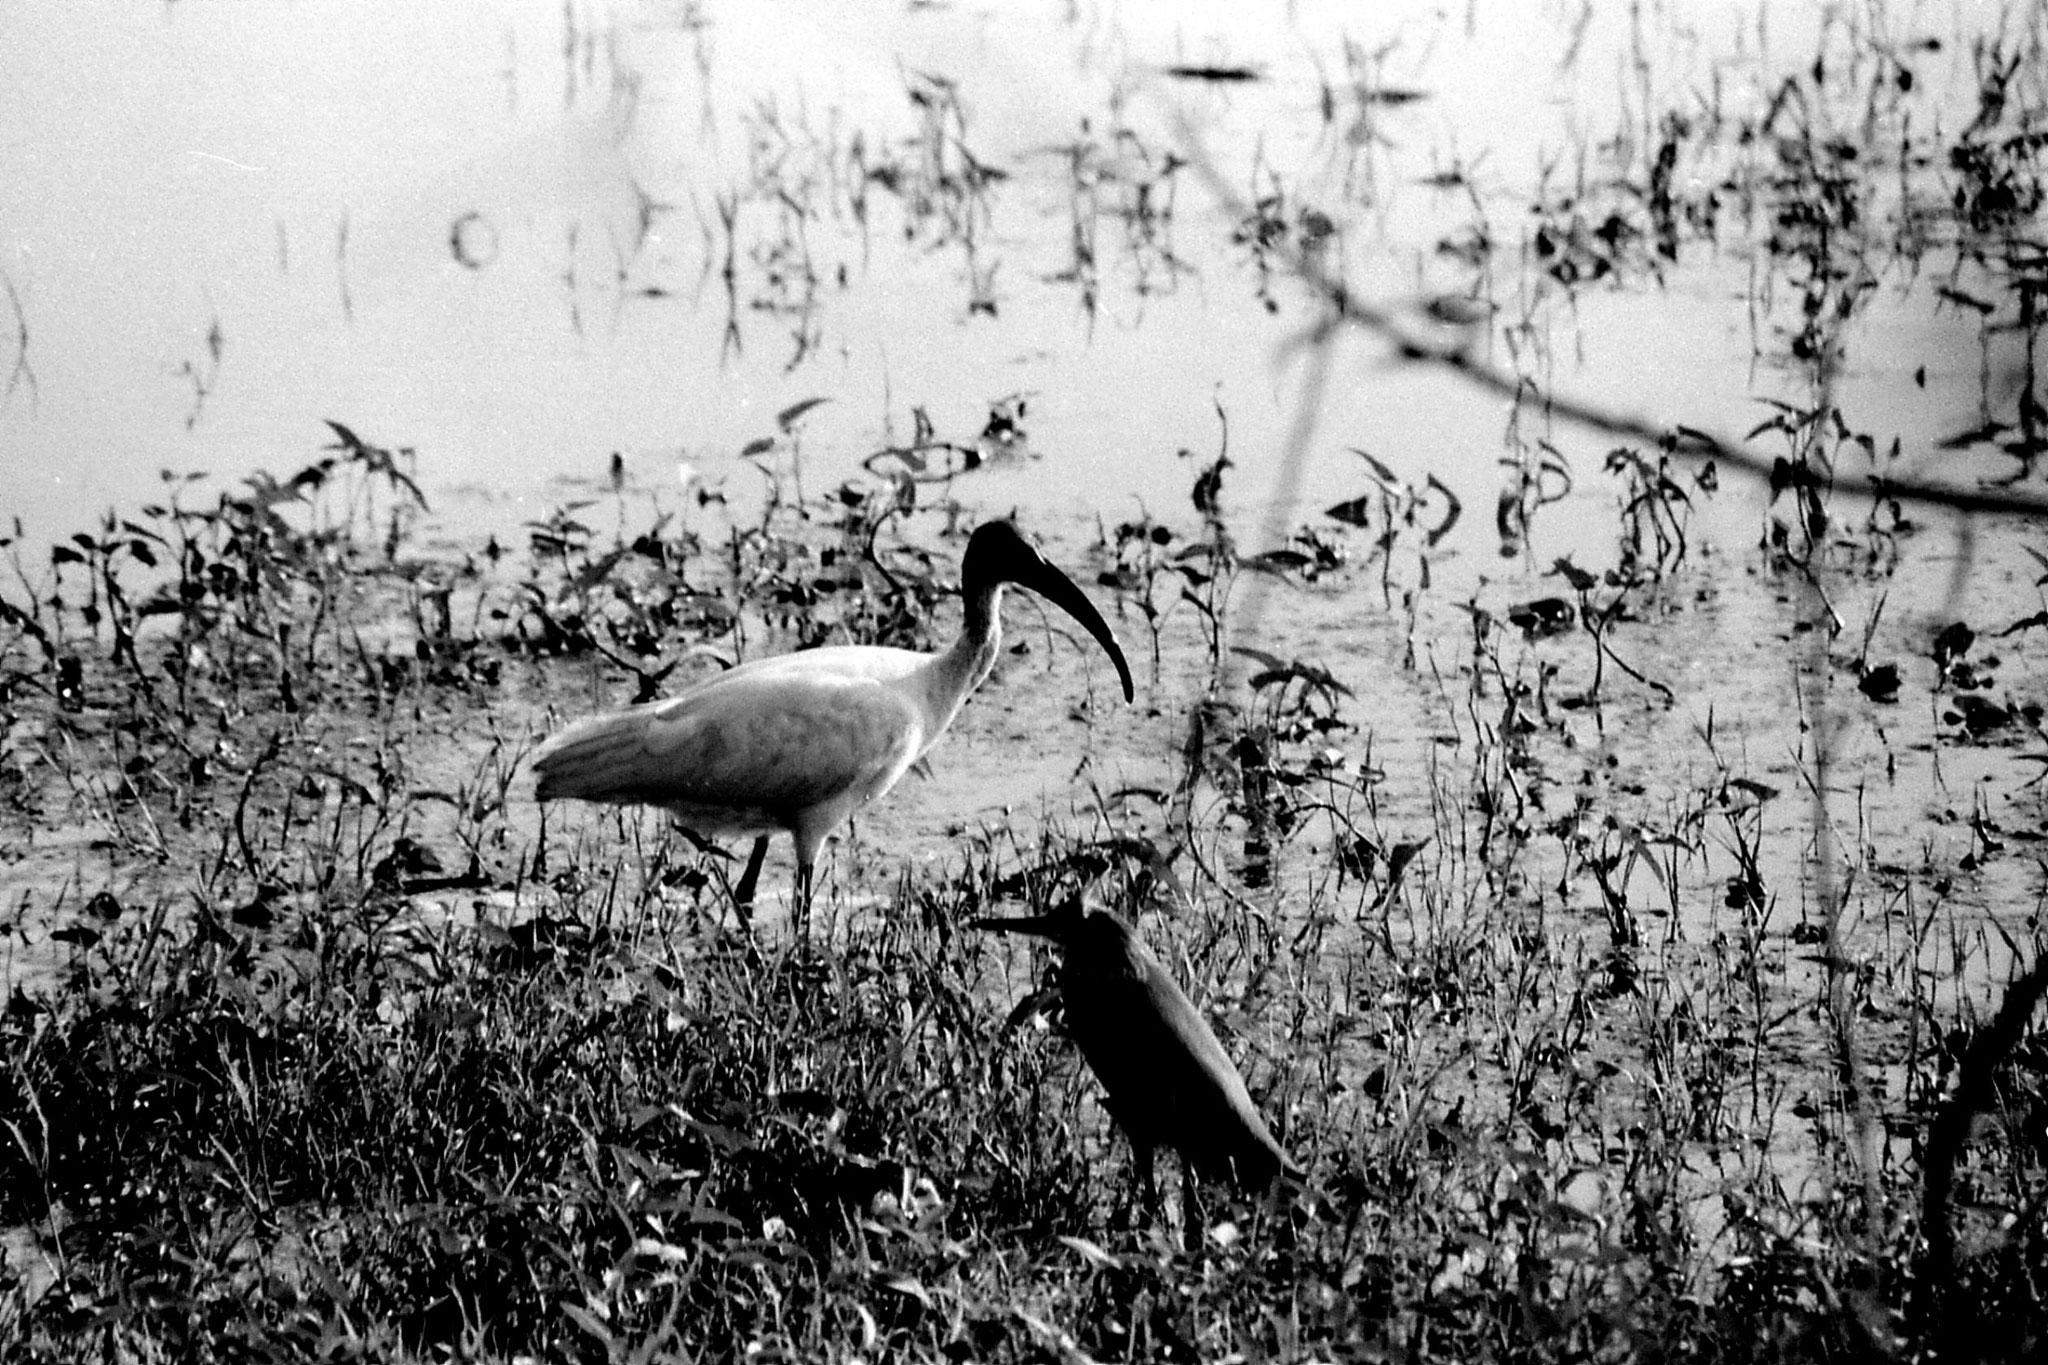 1/4/1990: 26: Bharatpur Ibis and Pond Heron